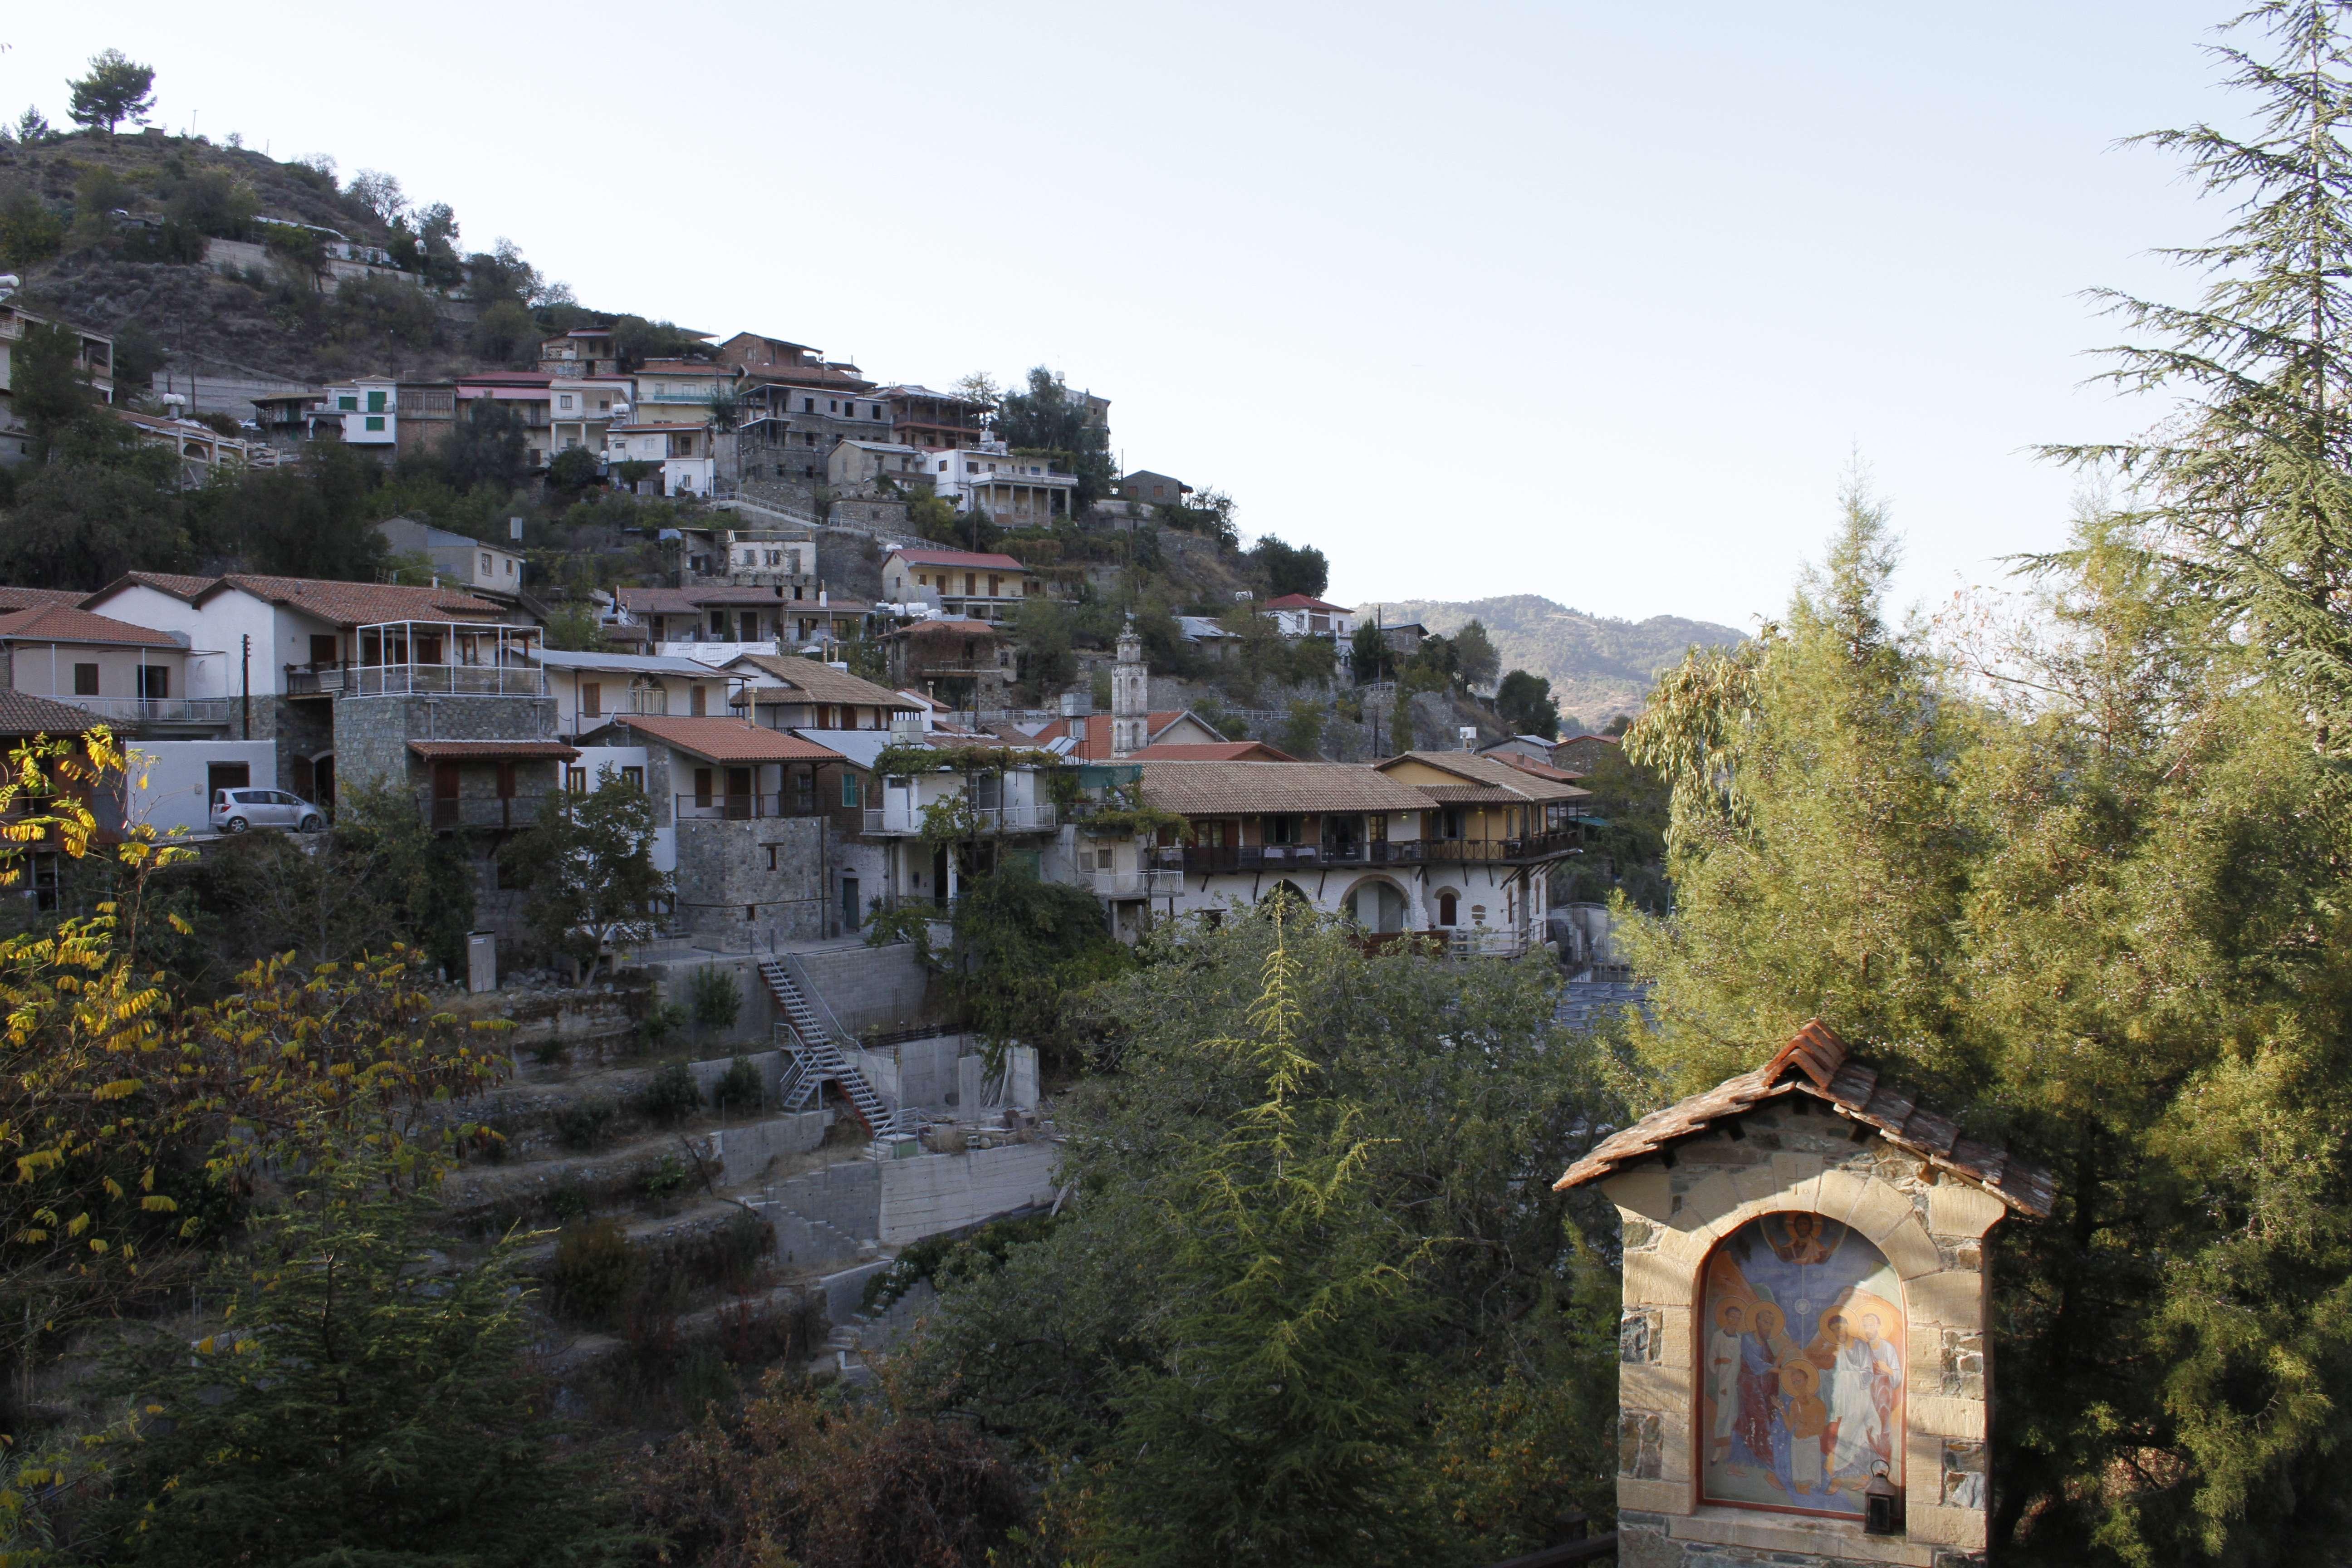 Chypre_0273 Kalopagianotis village de Monastere Ioannis Lambadisitis